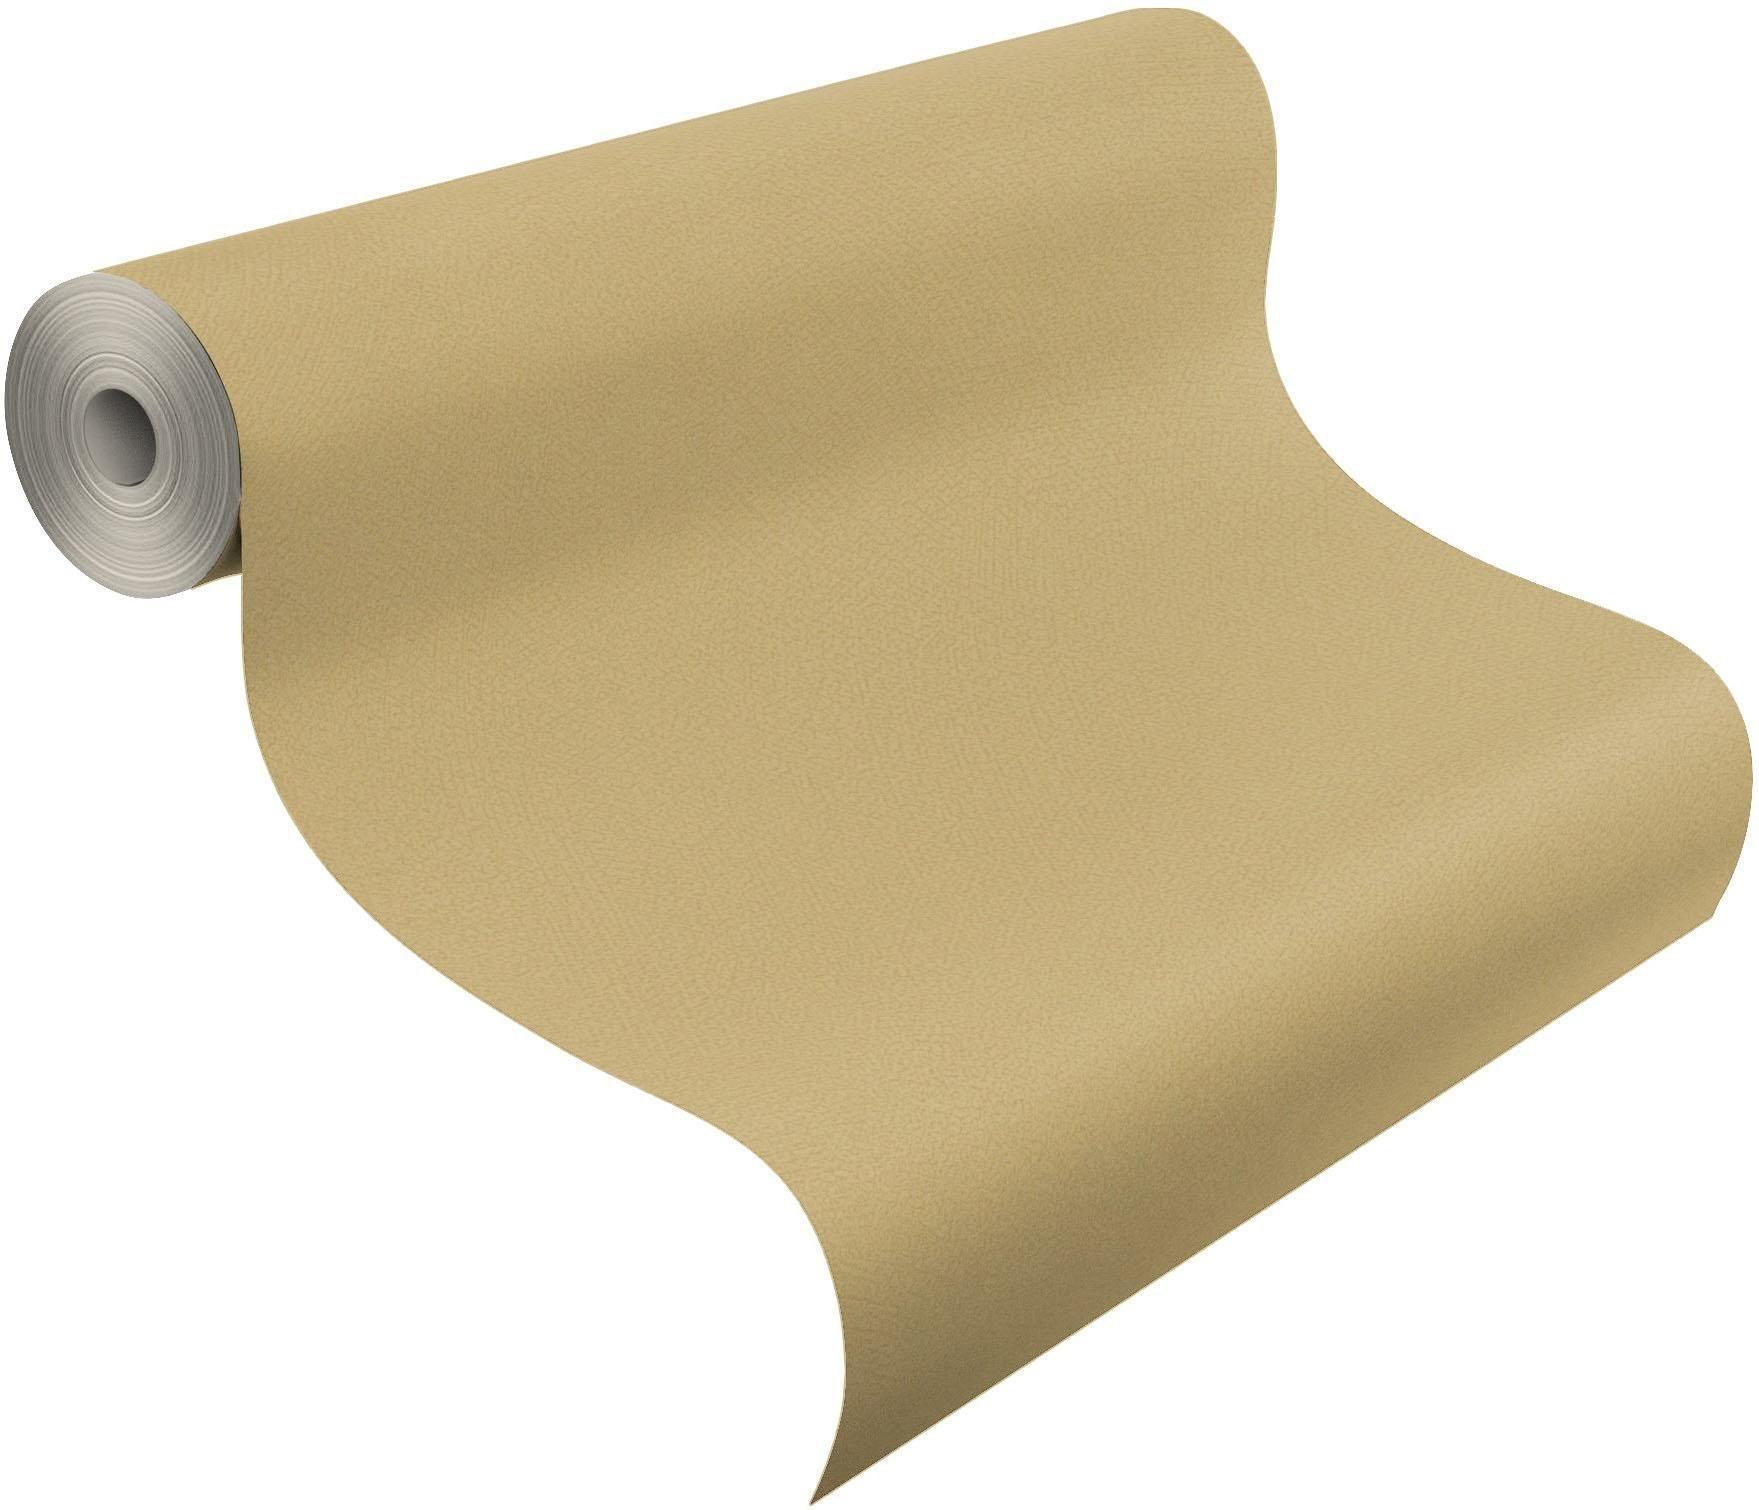 thomas sabo tapeten online kaufen m bel suchmaschine. Black Bedroom Furniture Sets. Home Design Ideas